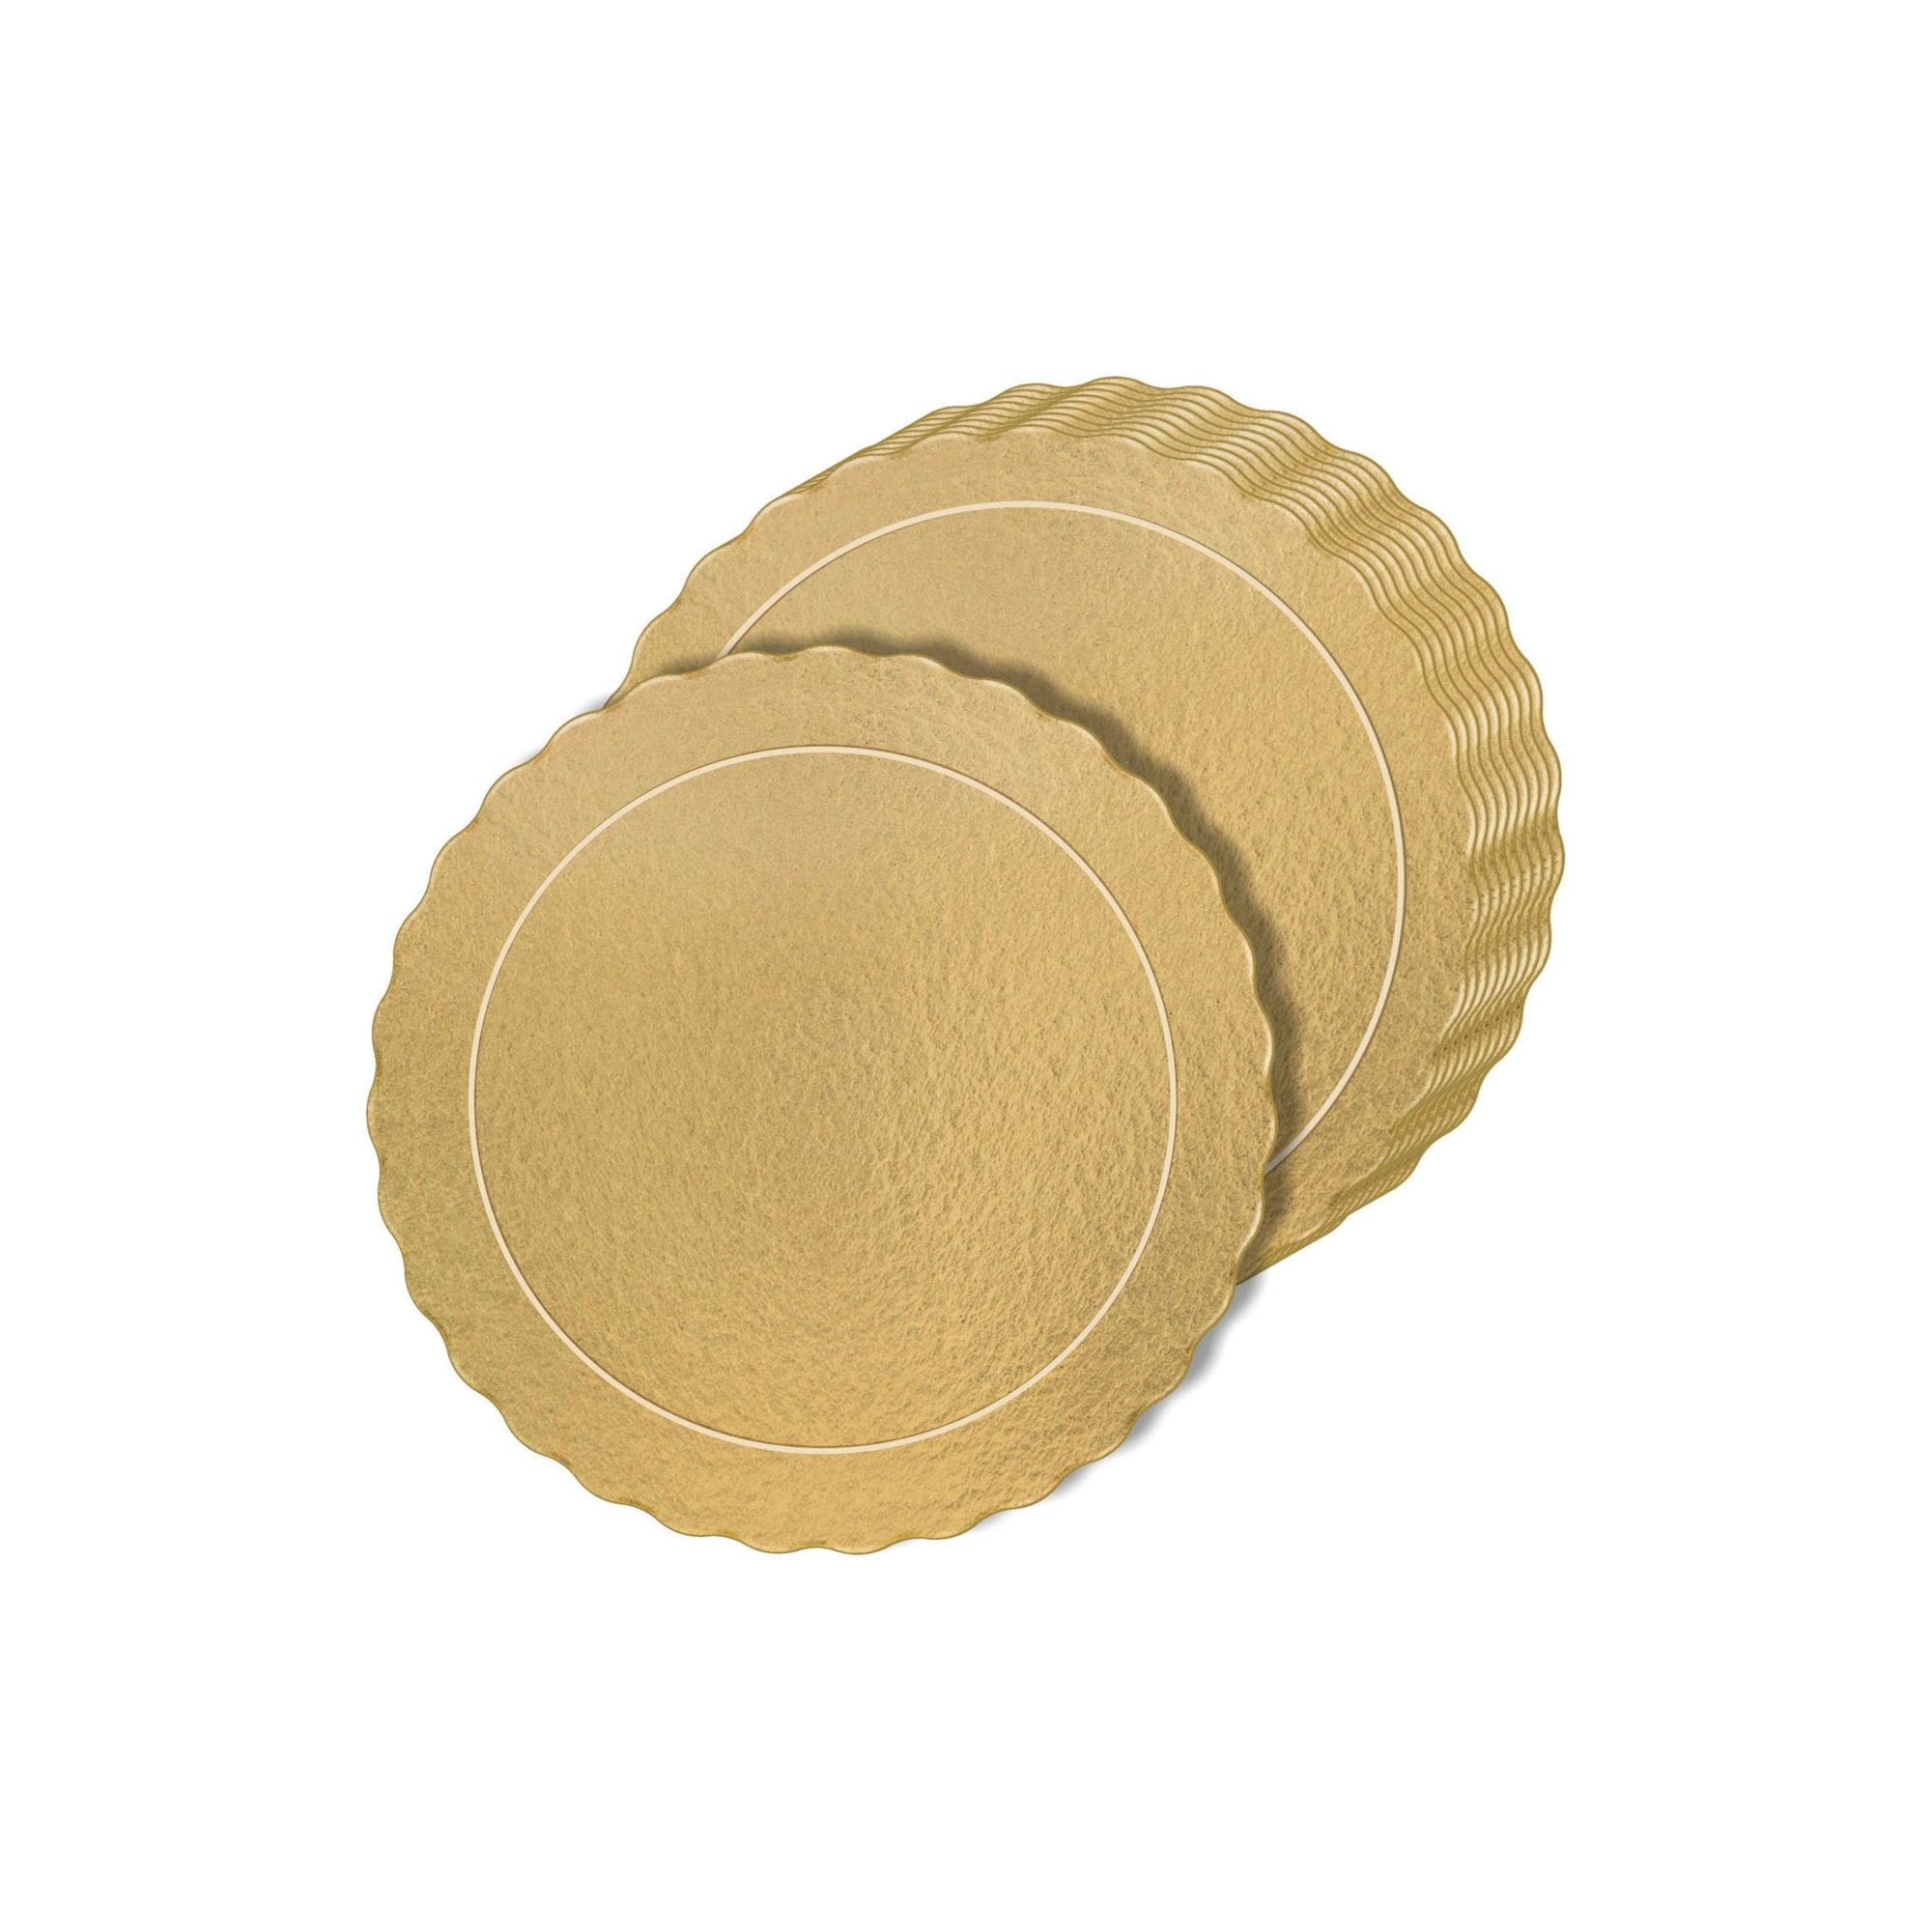 100 Bases Laminadas, Suporte P/ Bolo, Cake Board, 24cm - Ouro